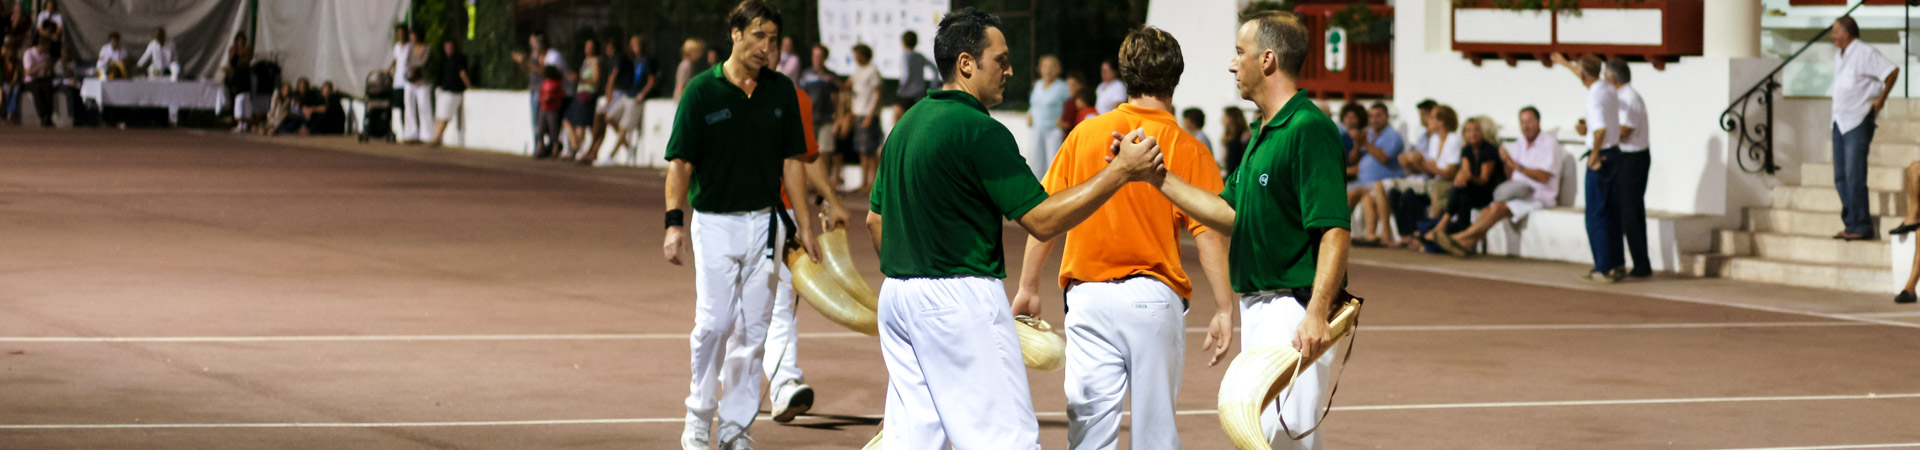 Jouer pelote basque pelotari cesta punta chistera fronton place libre